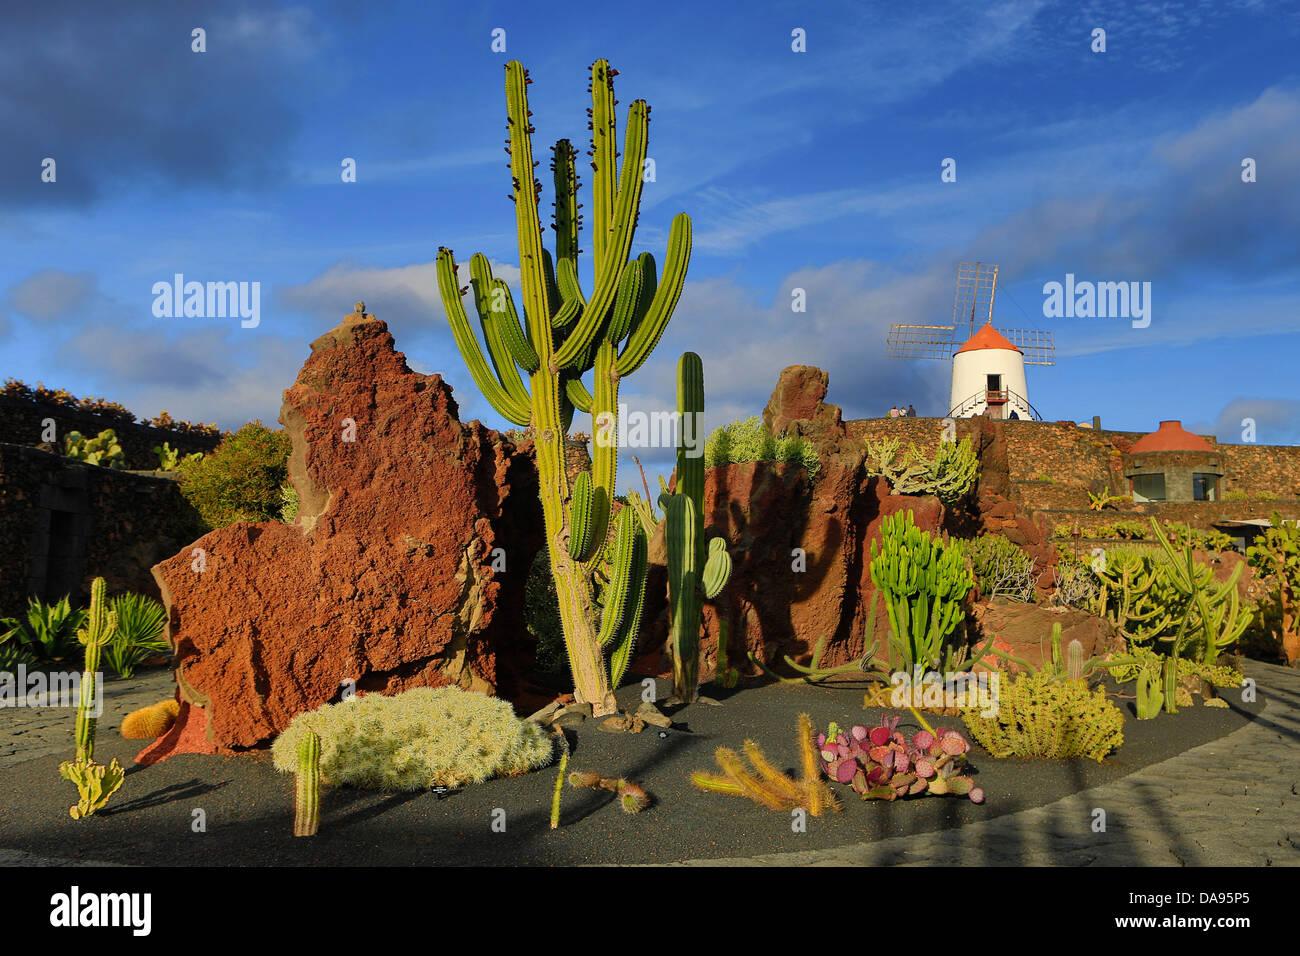 Spanien, Europa, Kanarische Inseln, Guatiza, Lanzarote, Kaktus, Pflanzen, Garten, Insel, Sonnenuntergang, Windmühle Stockbild